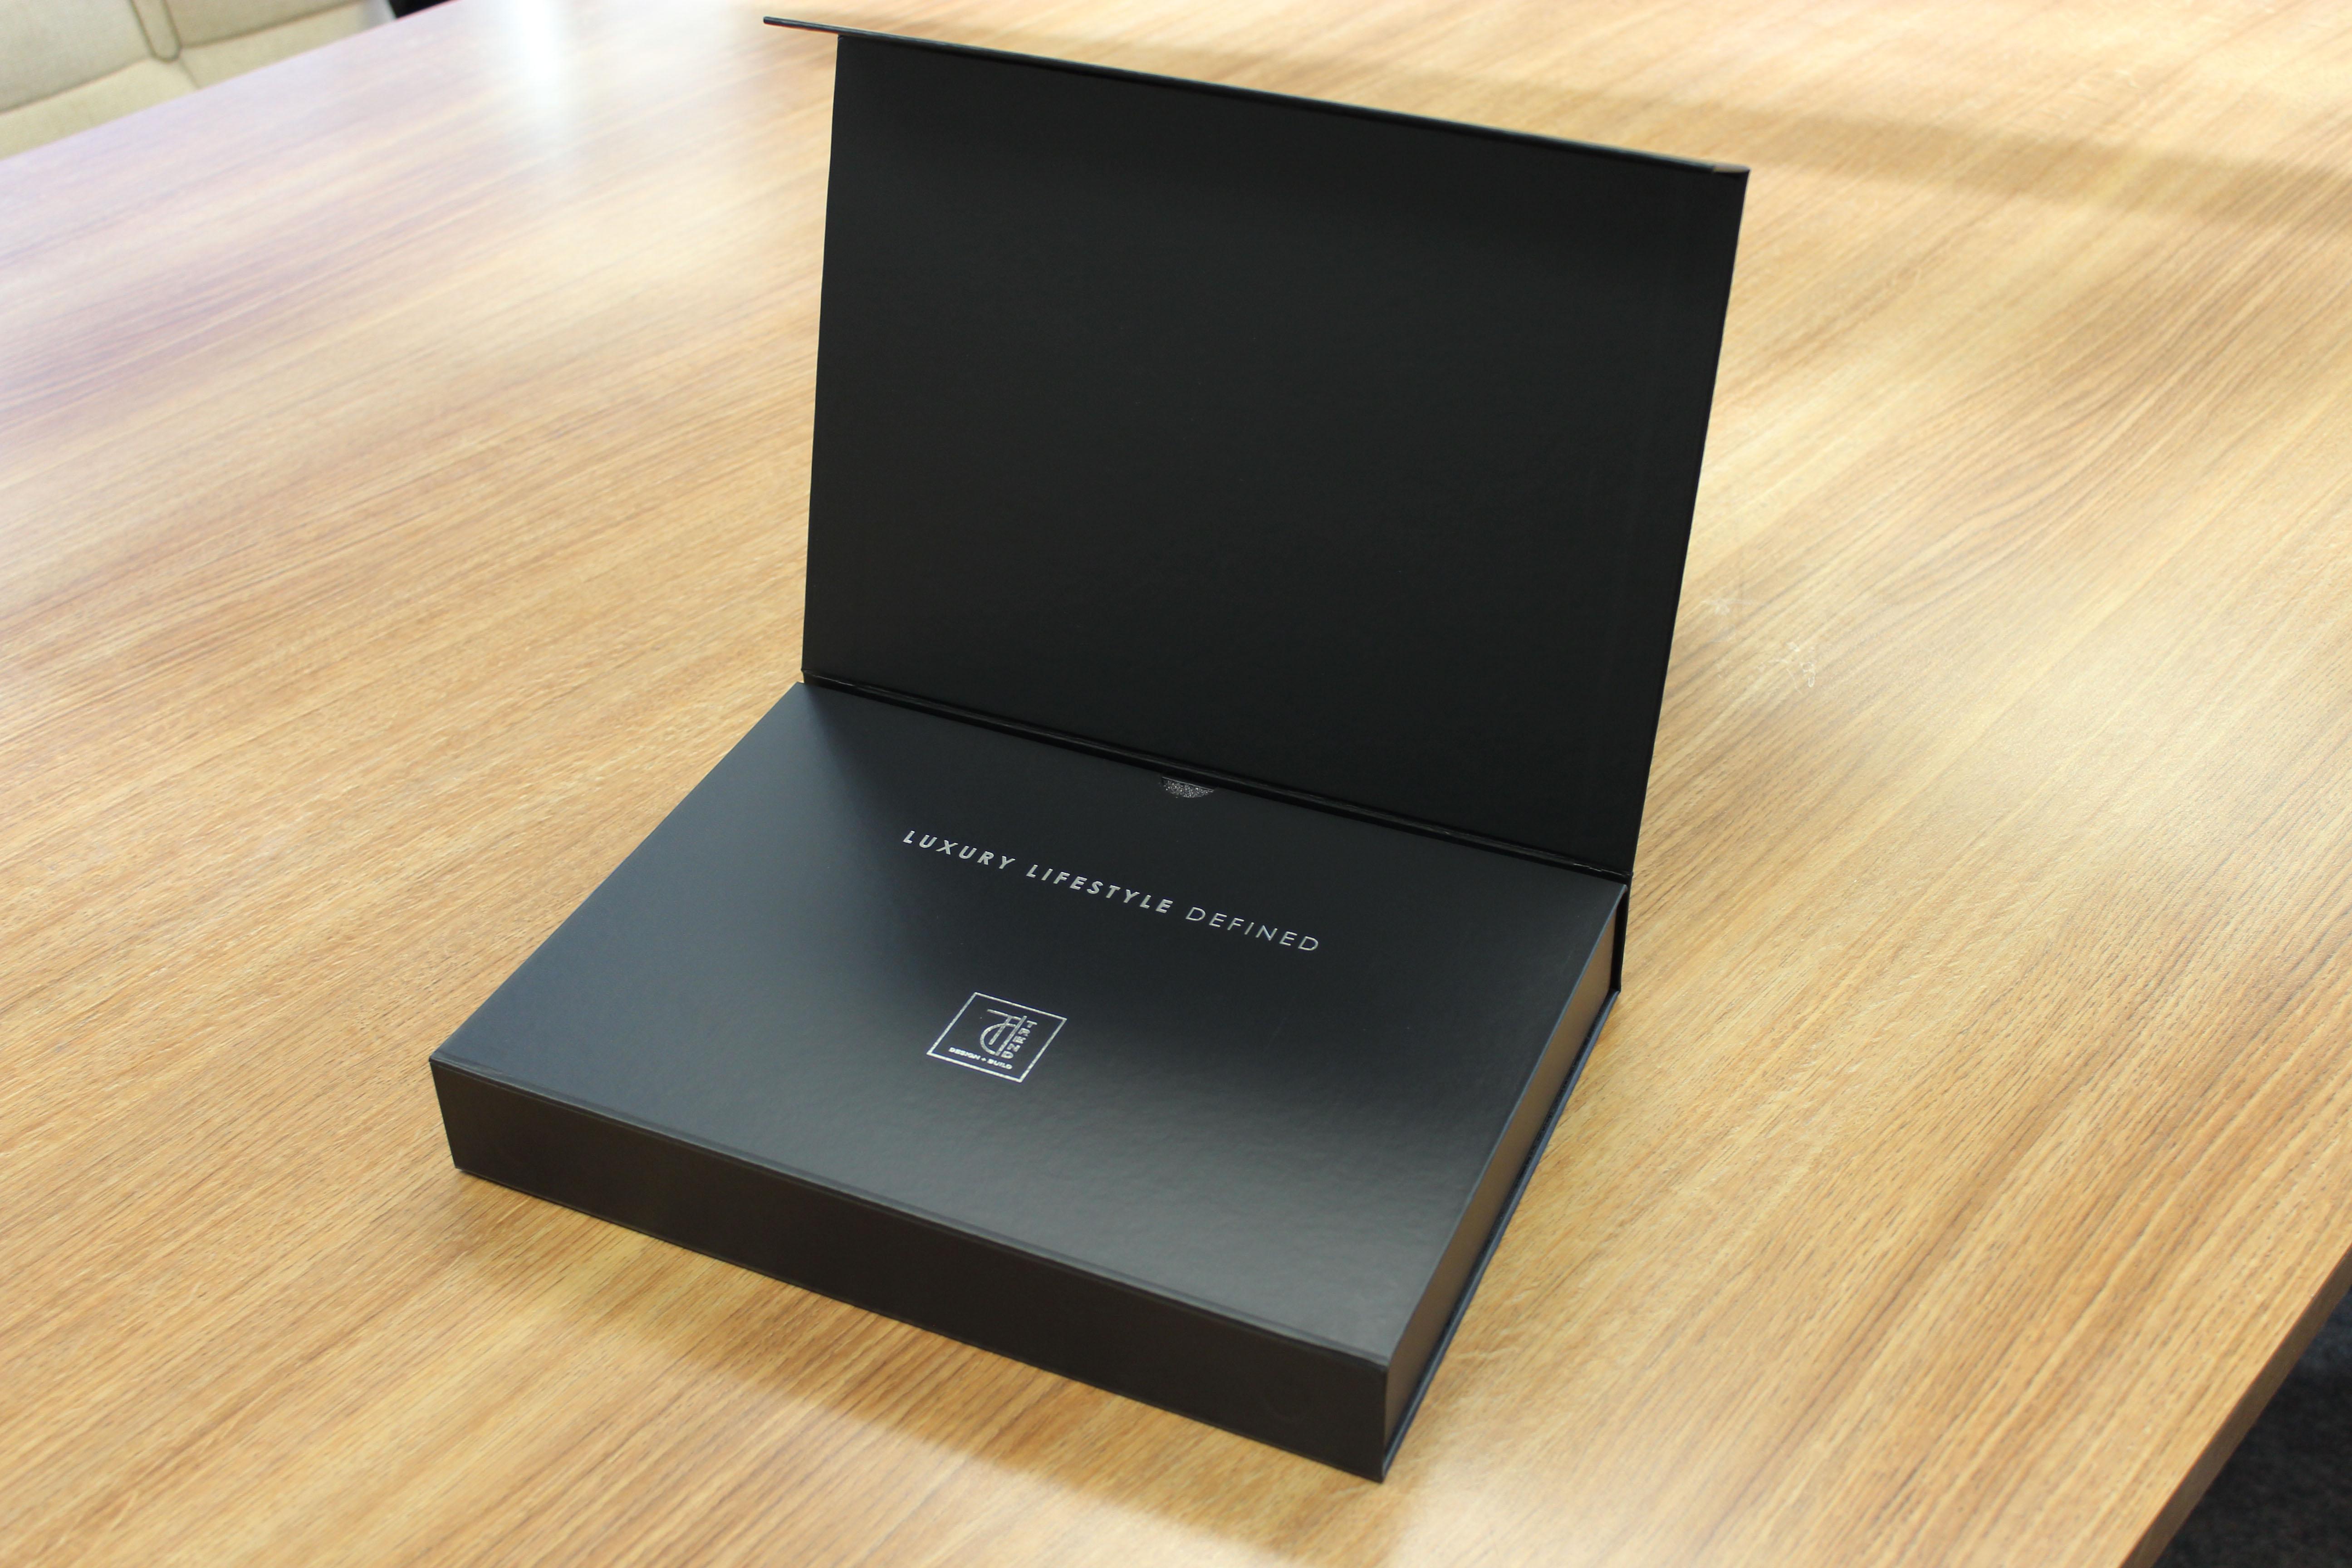 Black Ultima Cigar Box The Presentation Packaging Experts